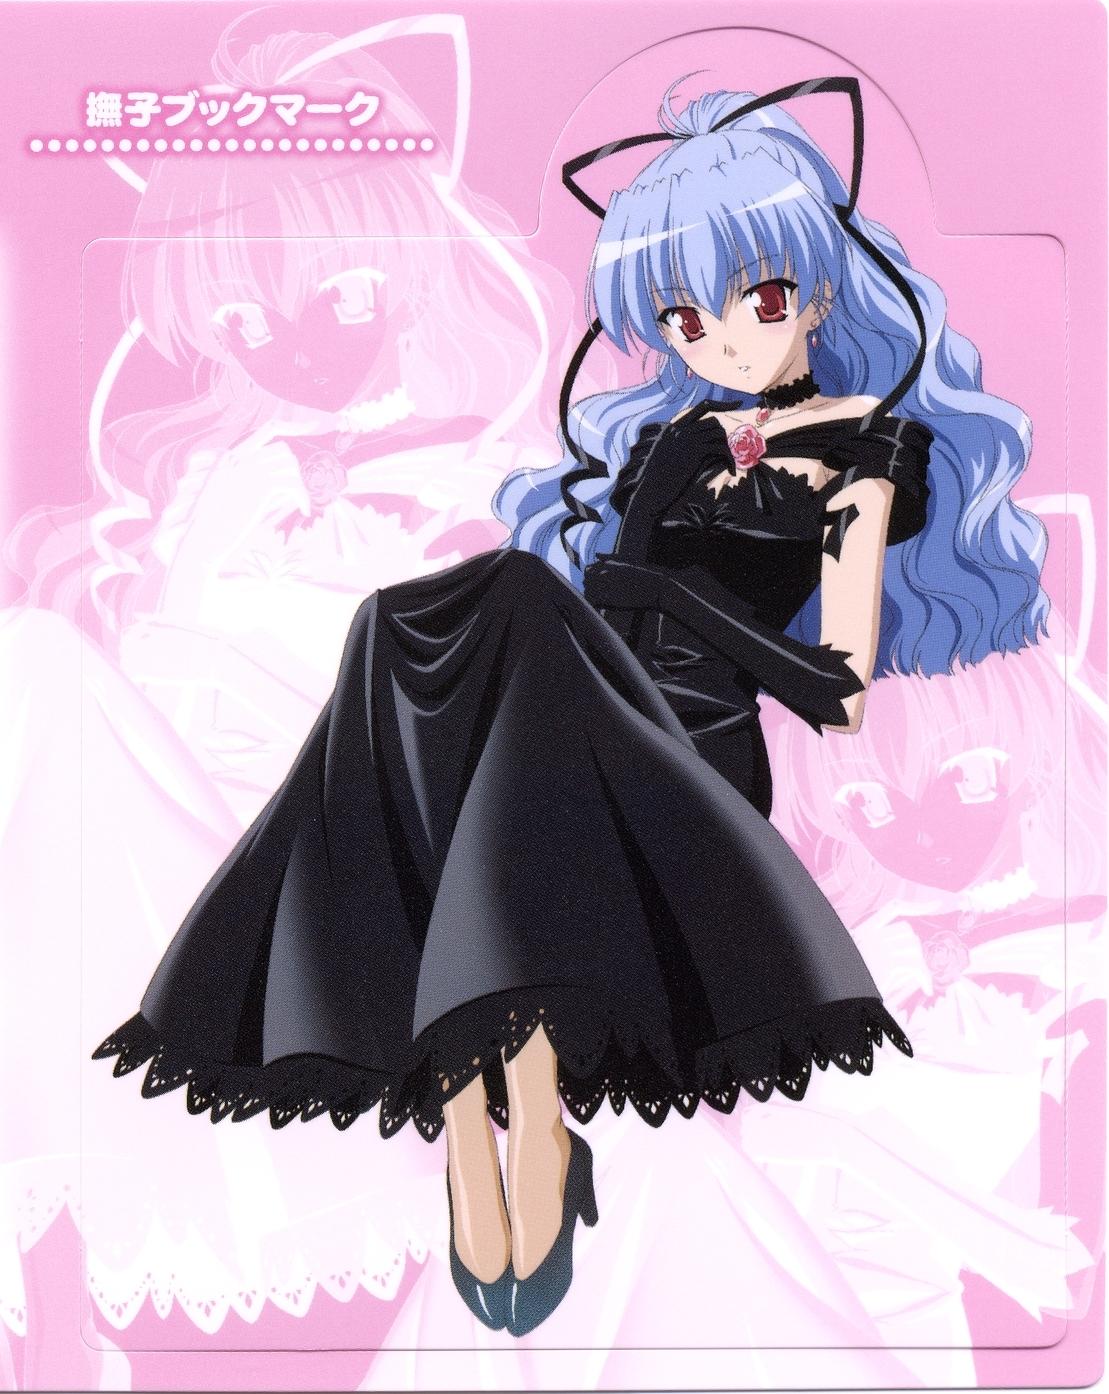 Canvas 2 Anime Characters : Canvas akane iro no palette zerochan anime image board